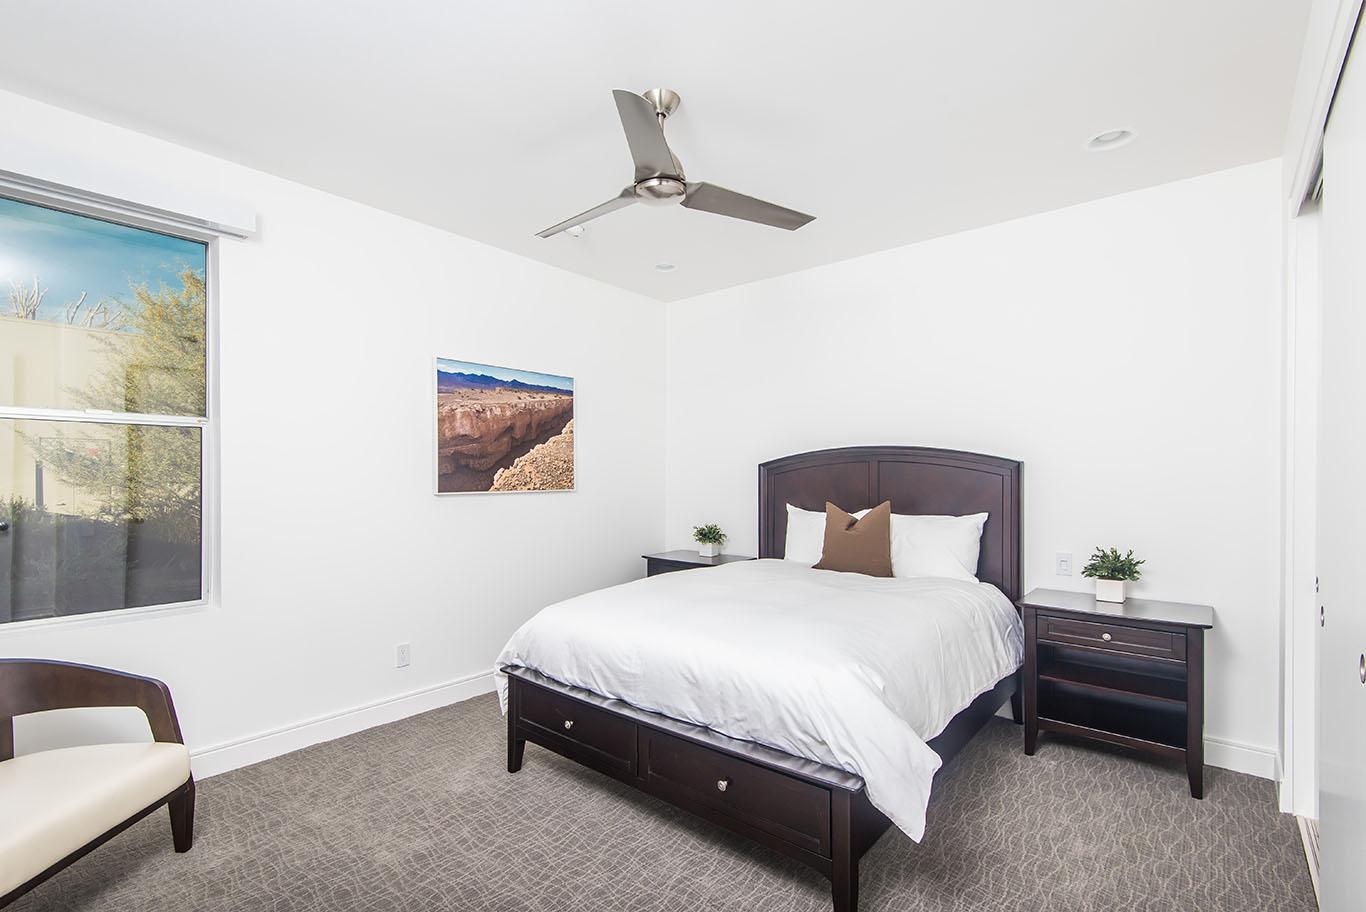 Guest Room 1 with Queen Bed